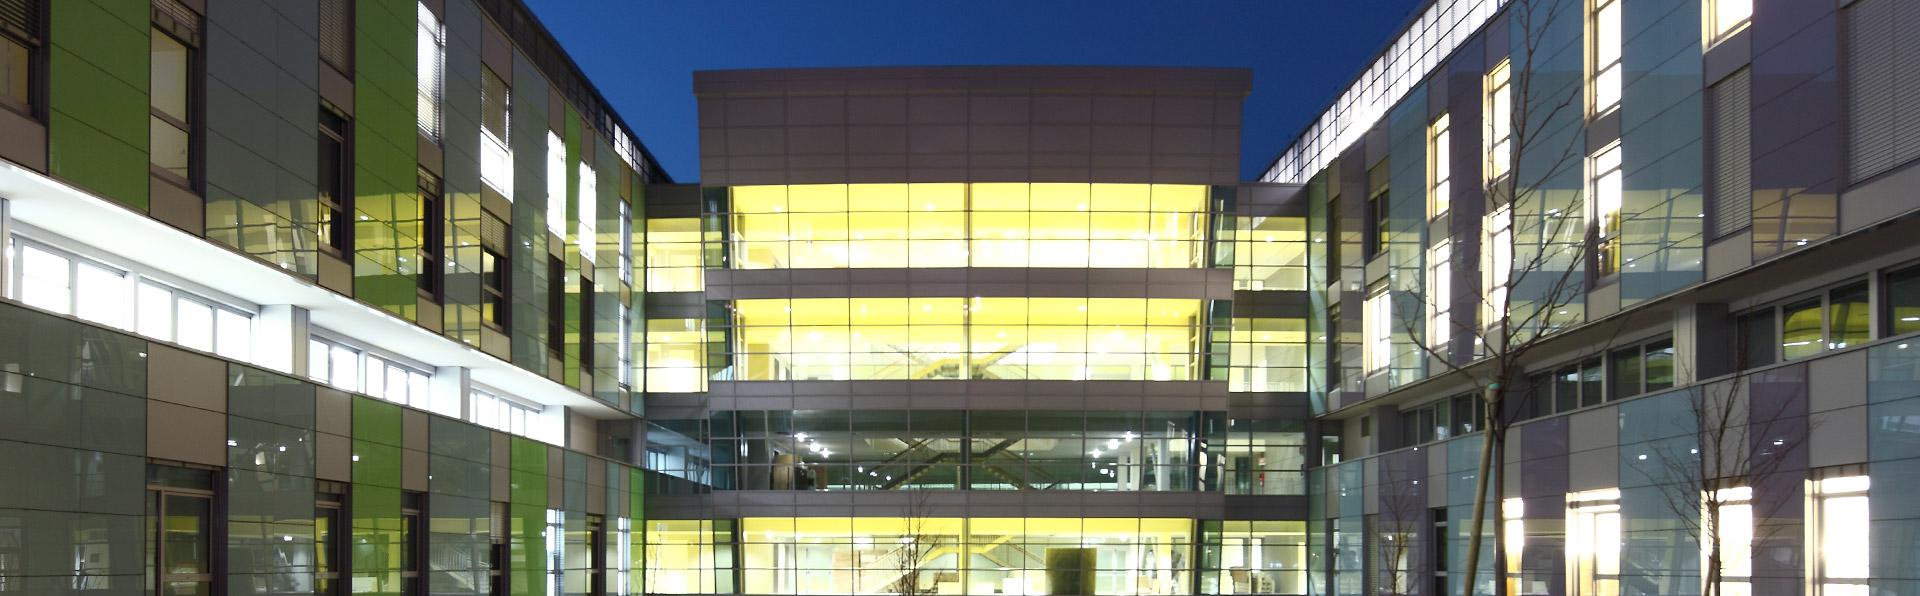 cmb-hospitals-ospedali-altovicentino